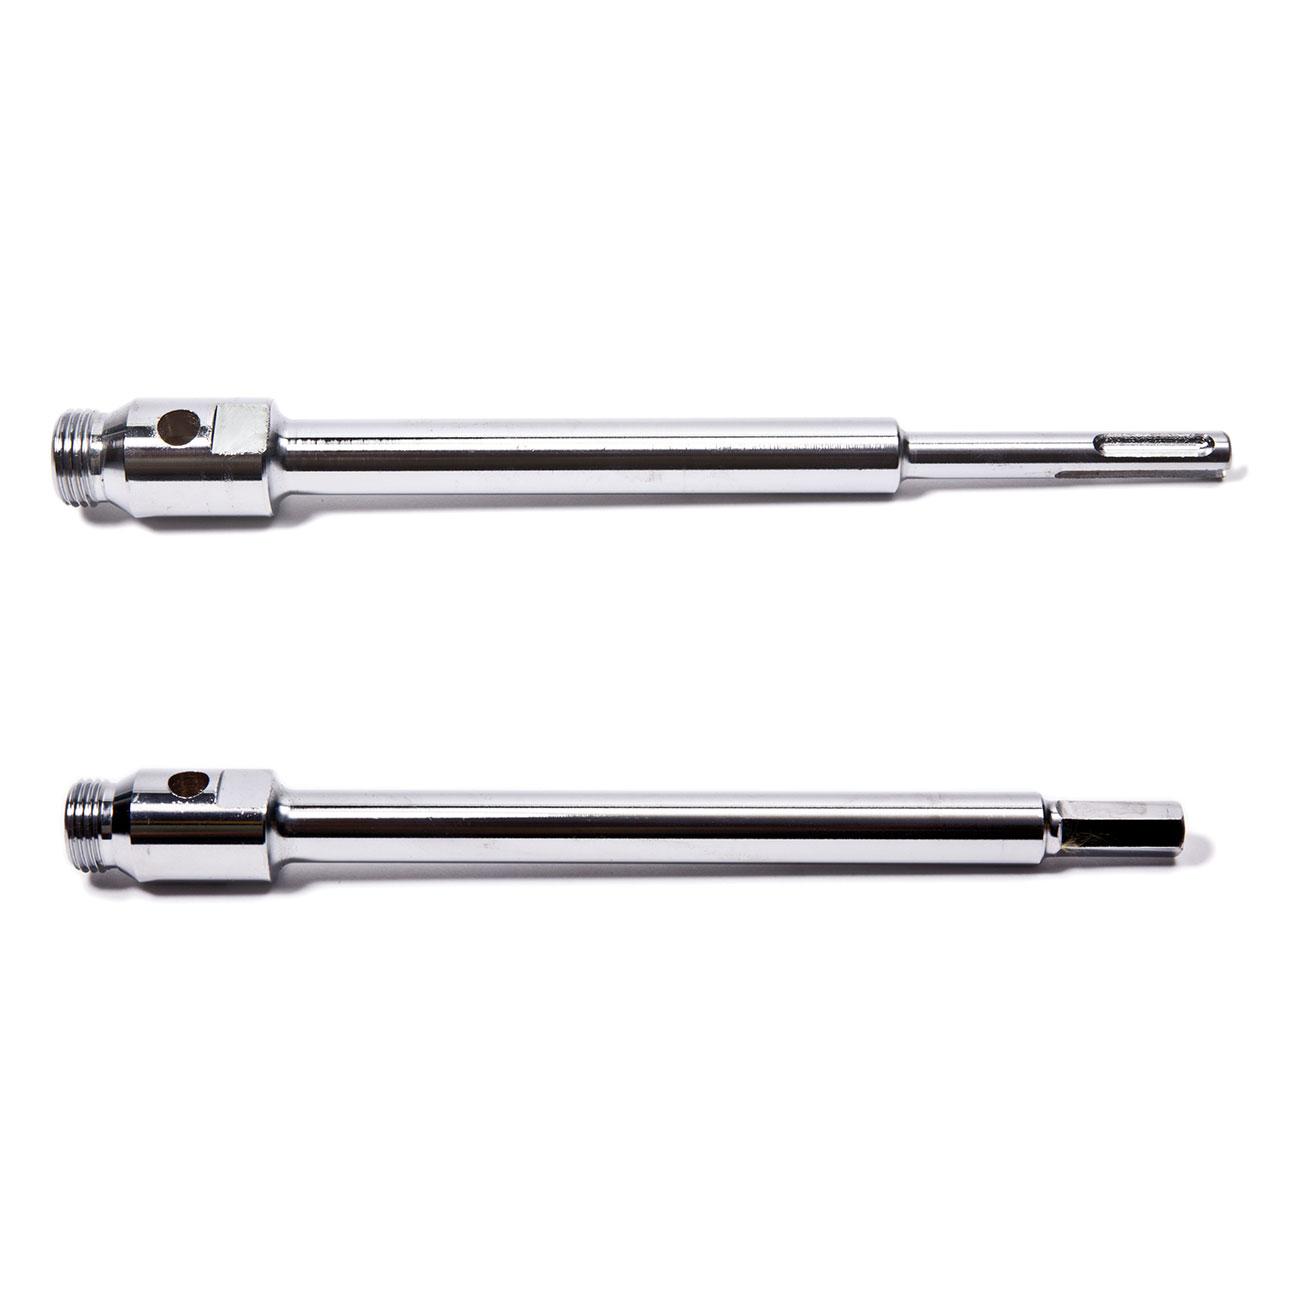 Drill Bit Extension - Core Drill Extension - Classic Range